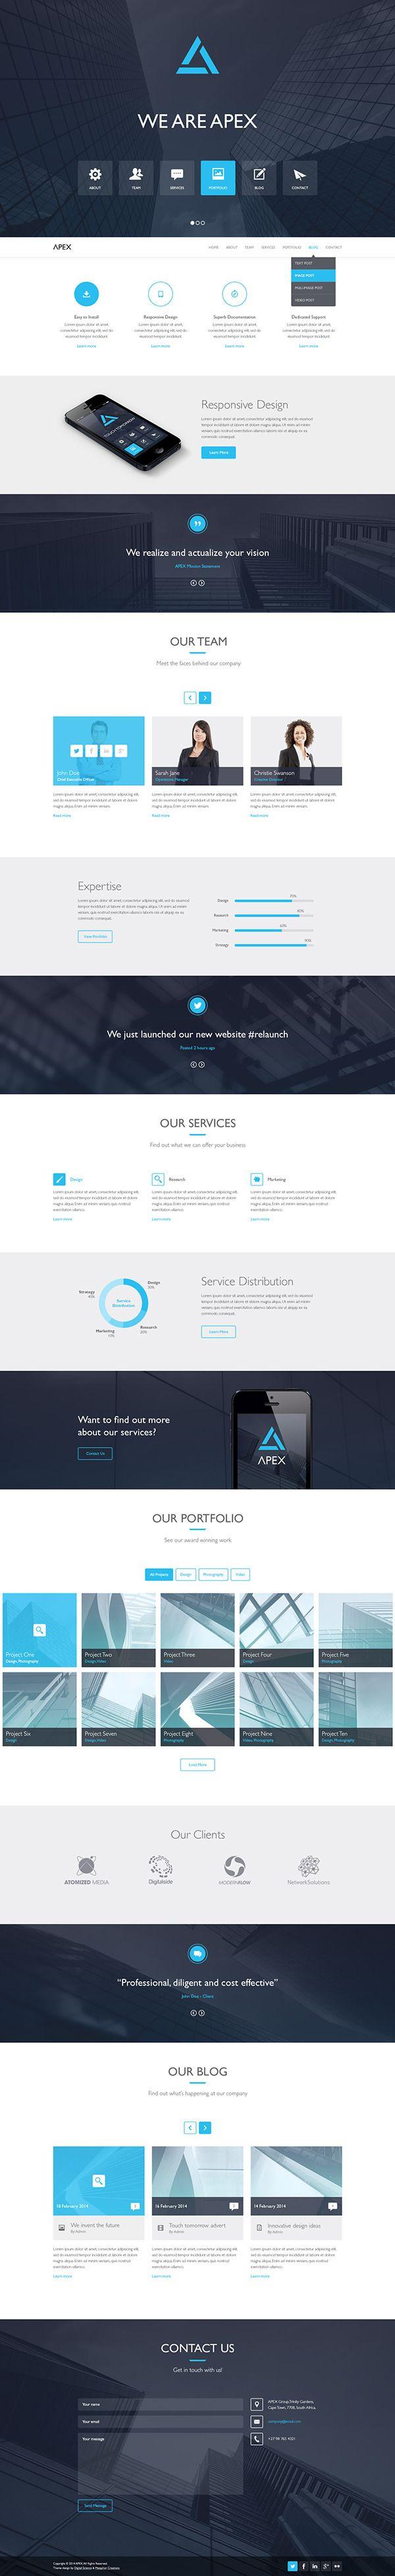 Apex Responsive WordPress Theme on Behance